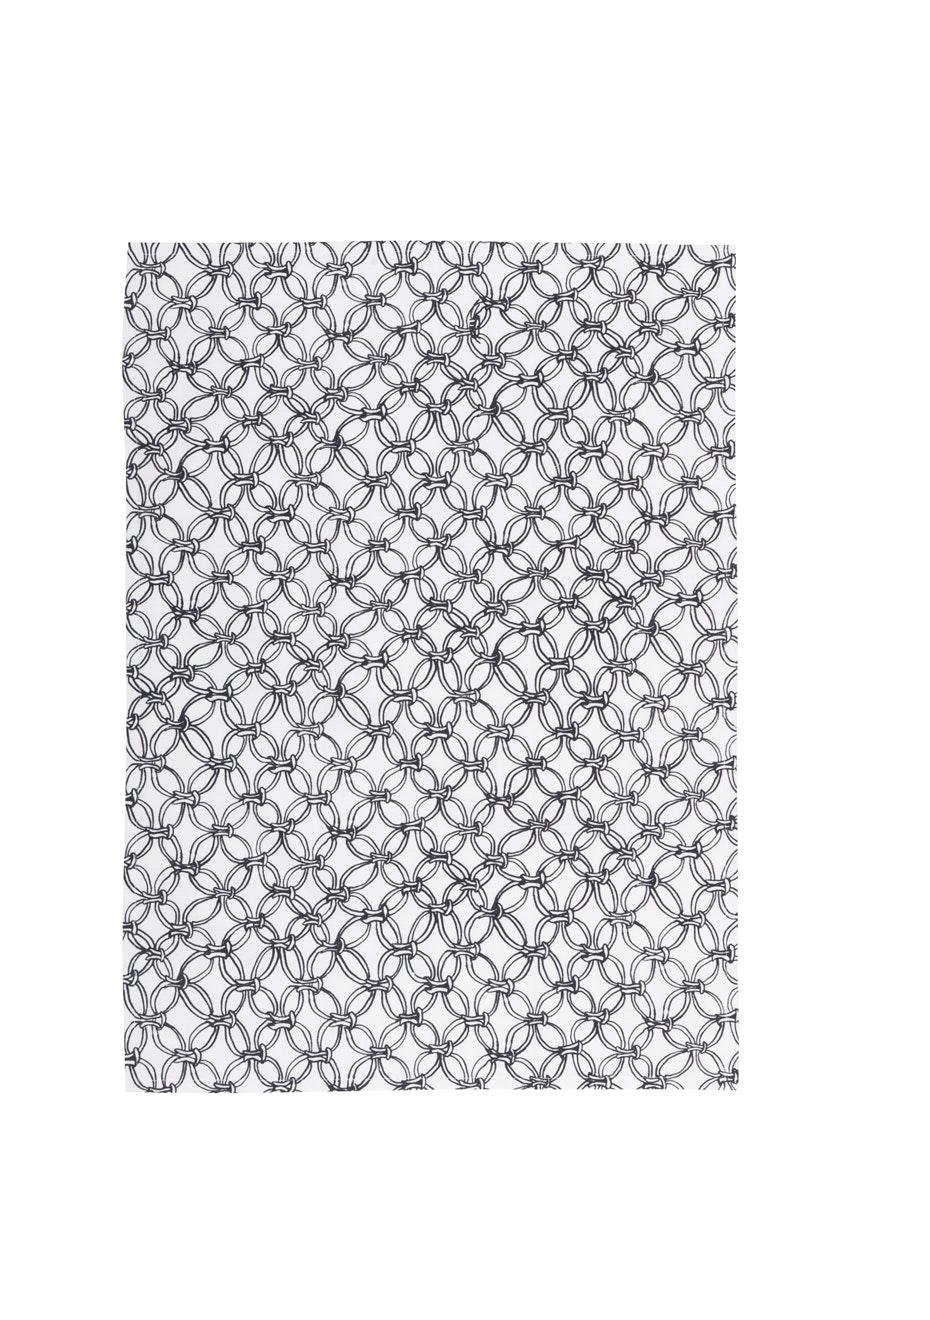 General Eclectic - Macrame Tea Towel